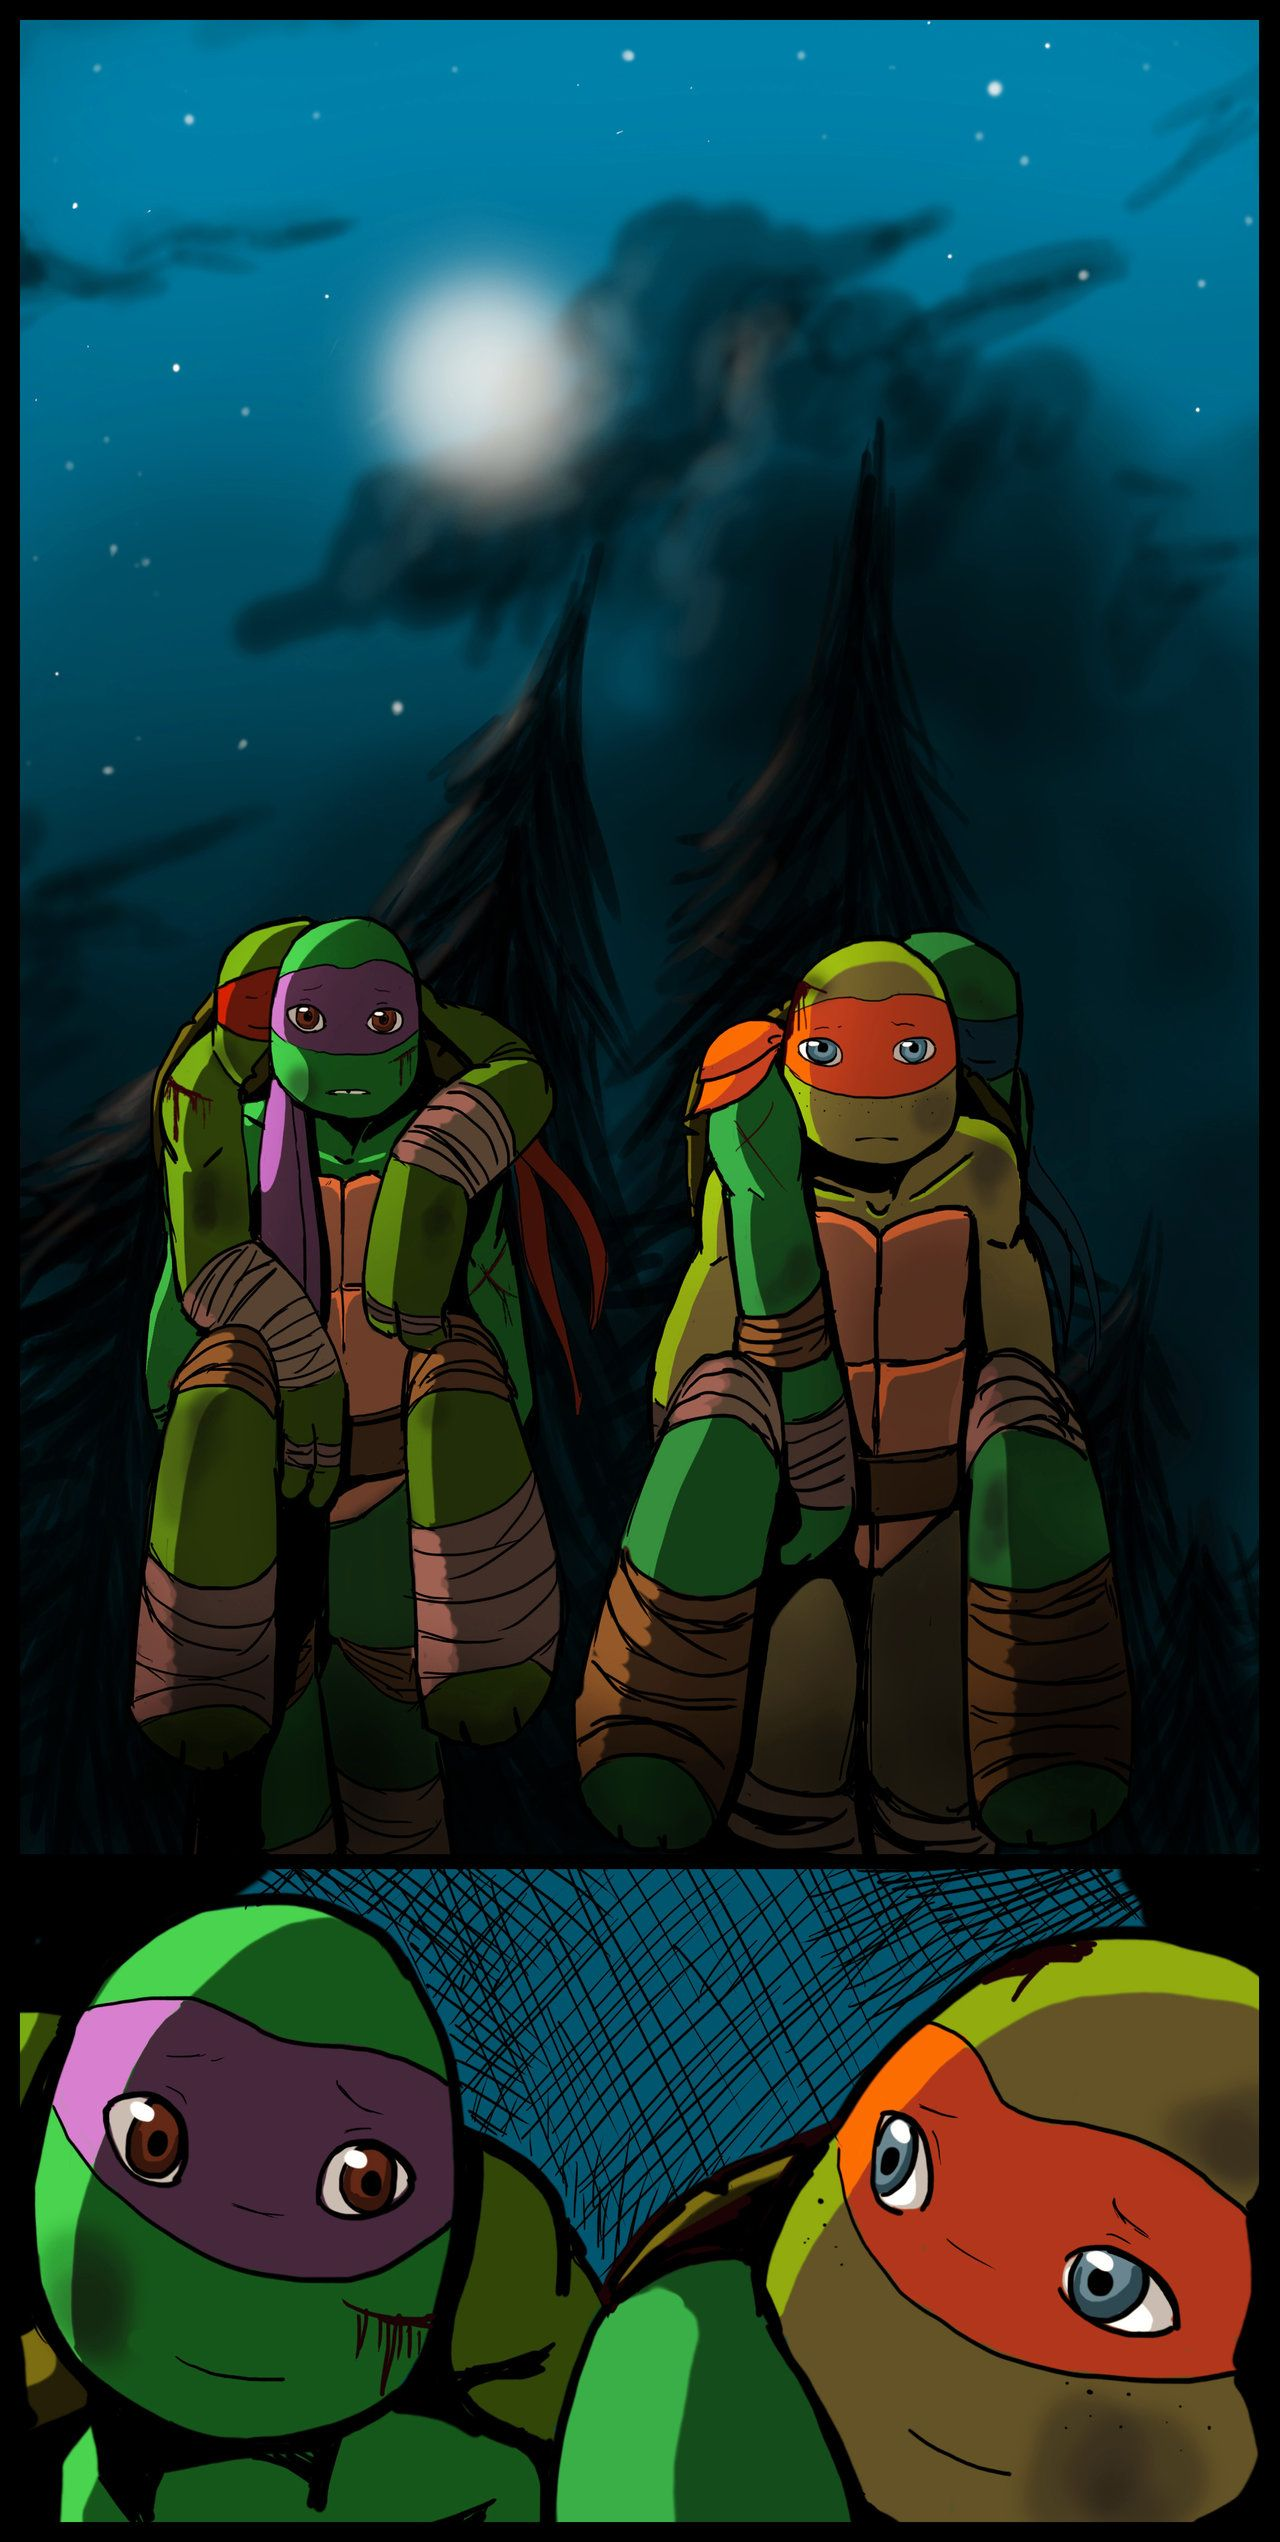 Big Brothers By Yinller Deviantart Com On Deviantart Teenage Ninja Turtles Ninja Turtles Art Teenage Mutant Ninja Turtles